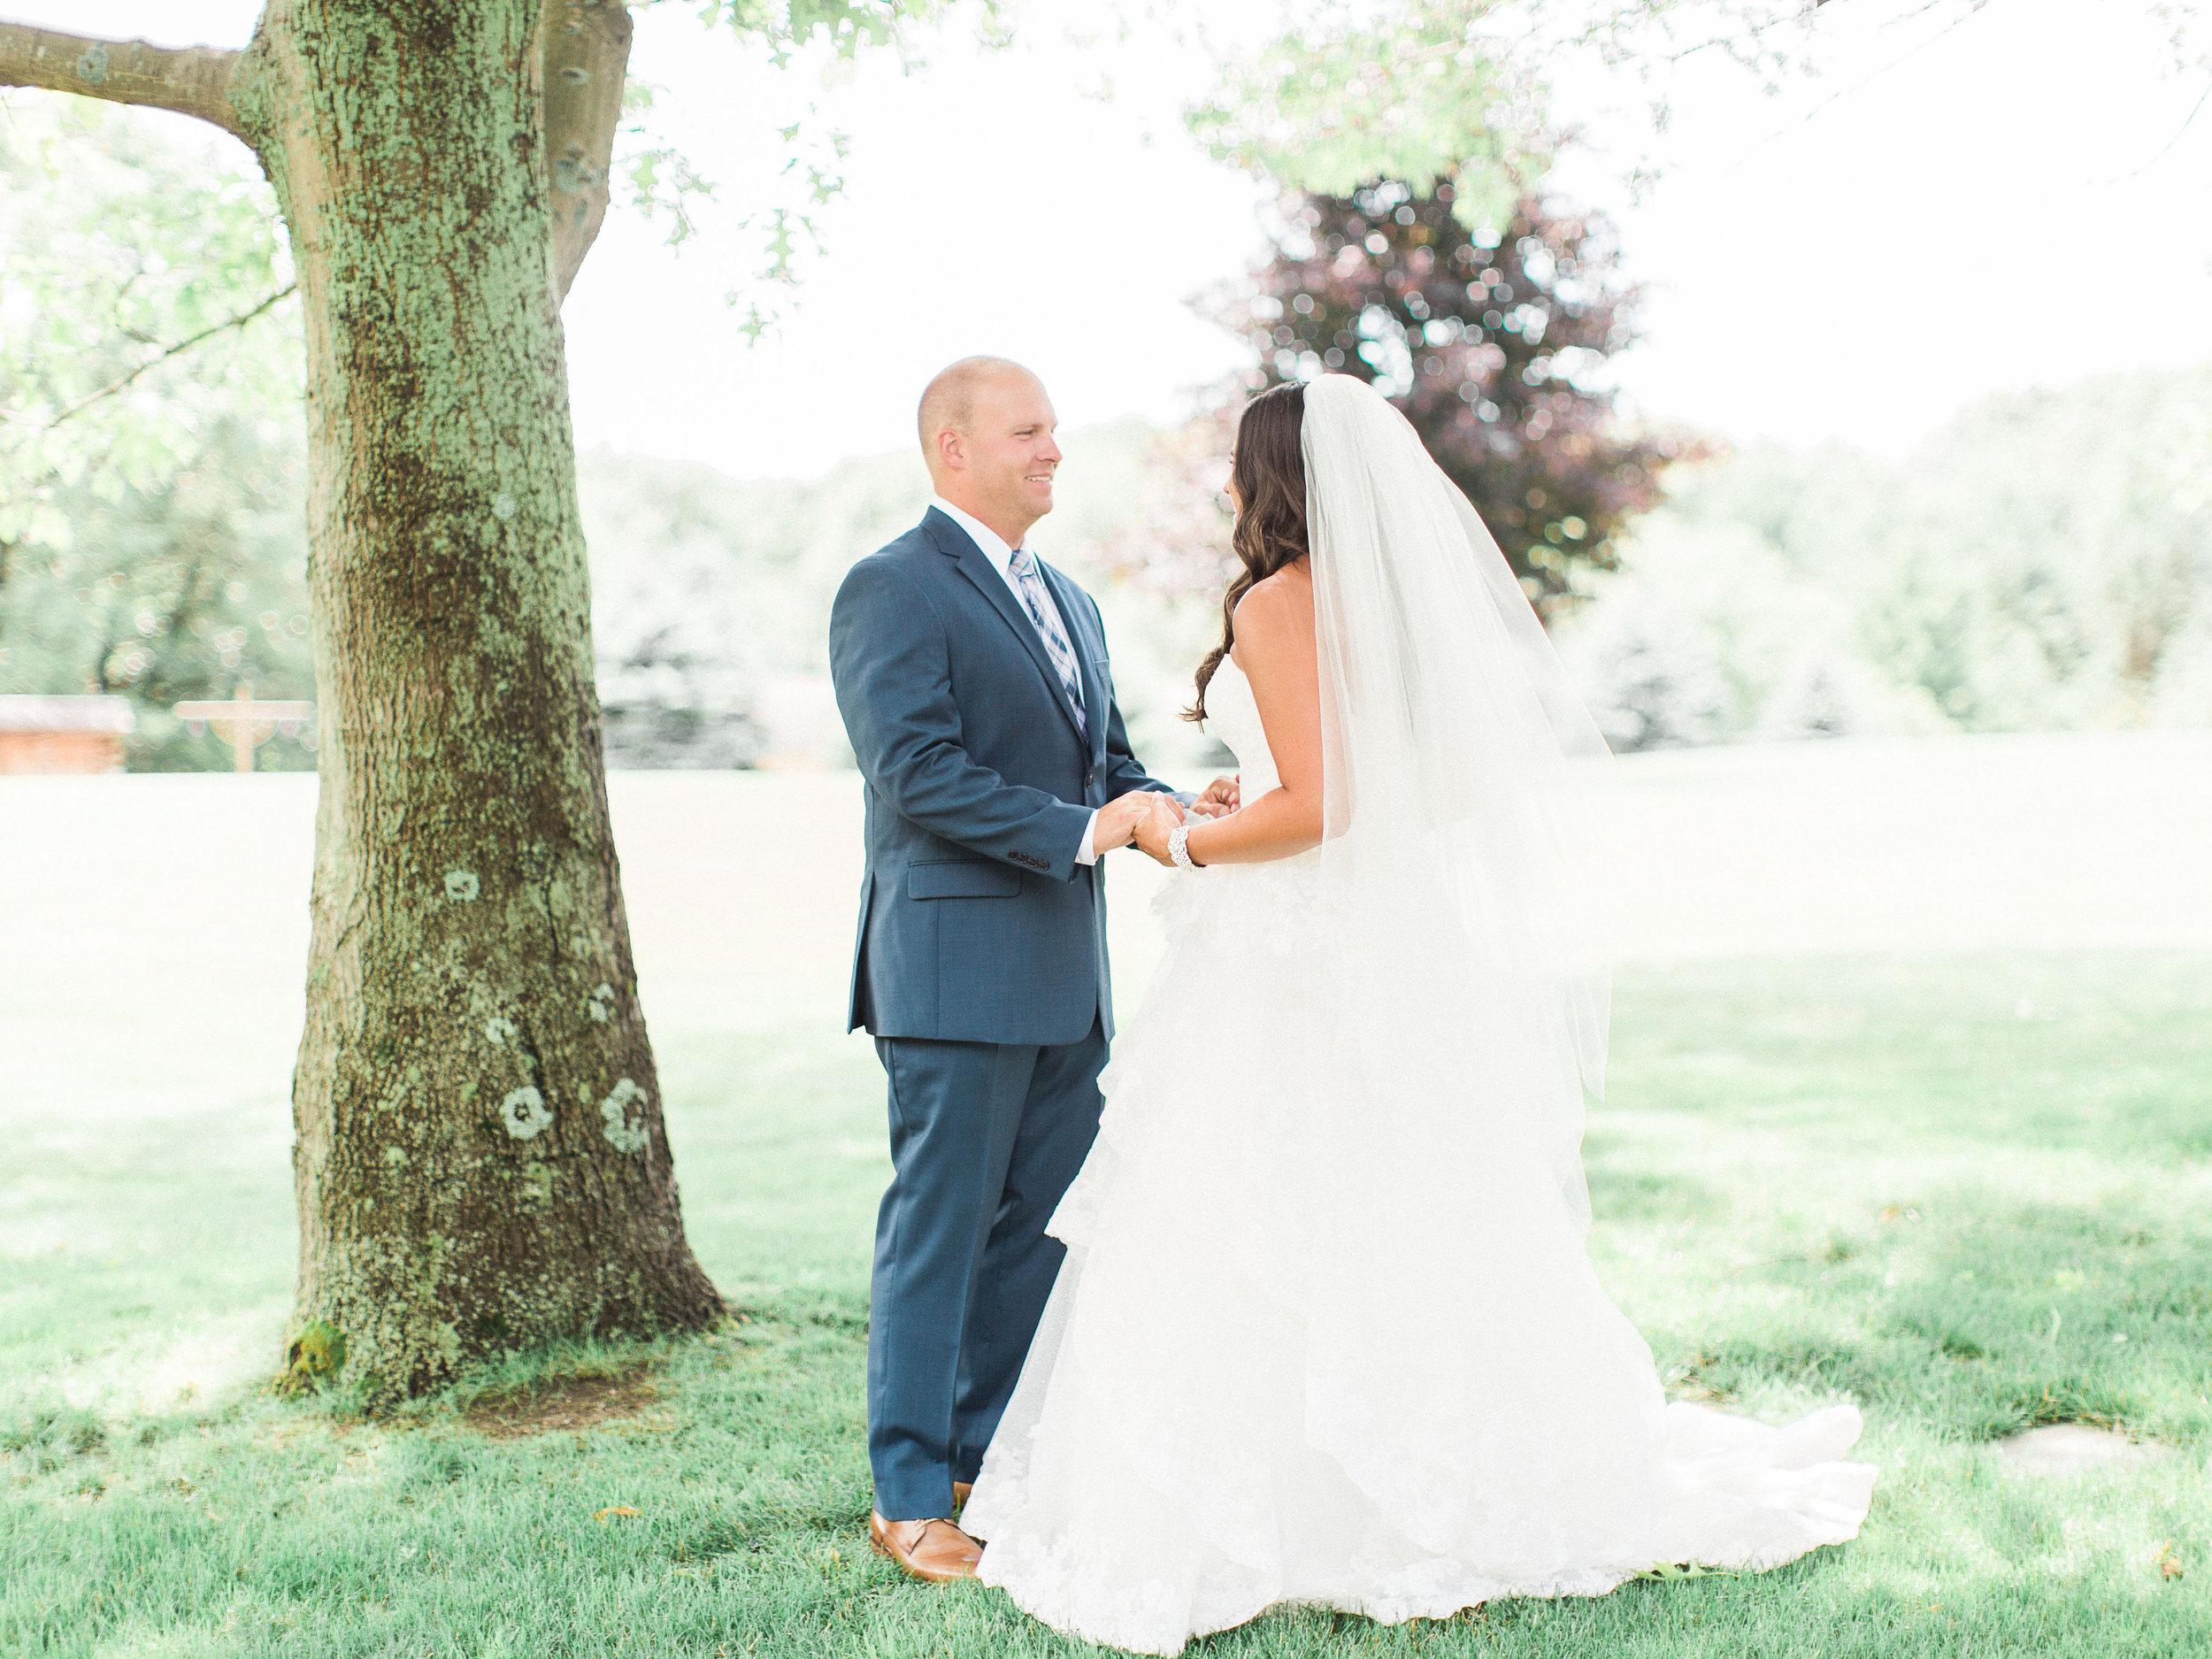 ERIC AND HALLIE WEDDING-HI RESOLUTION FOR PRINTING-0231.jpg